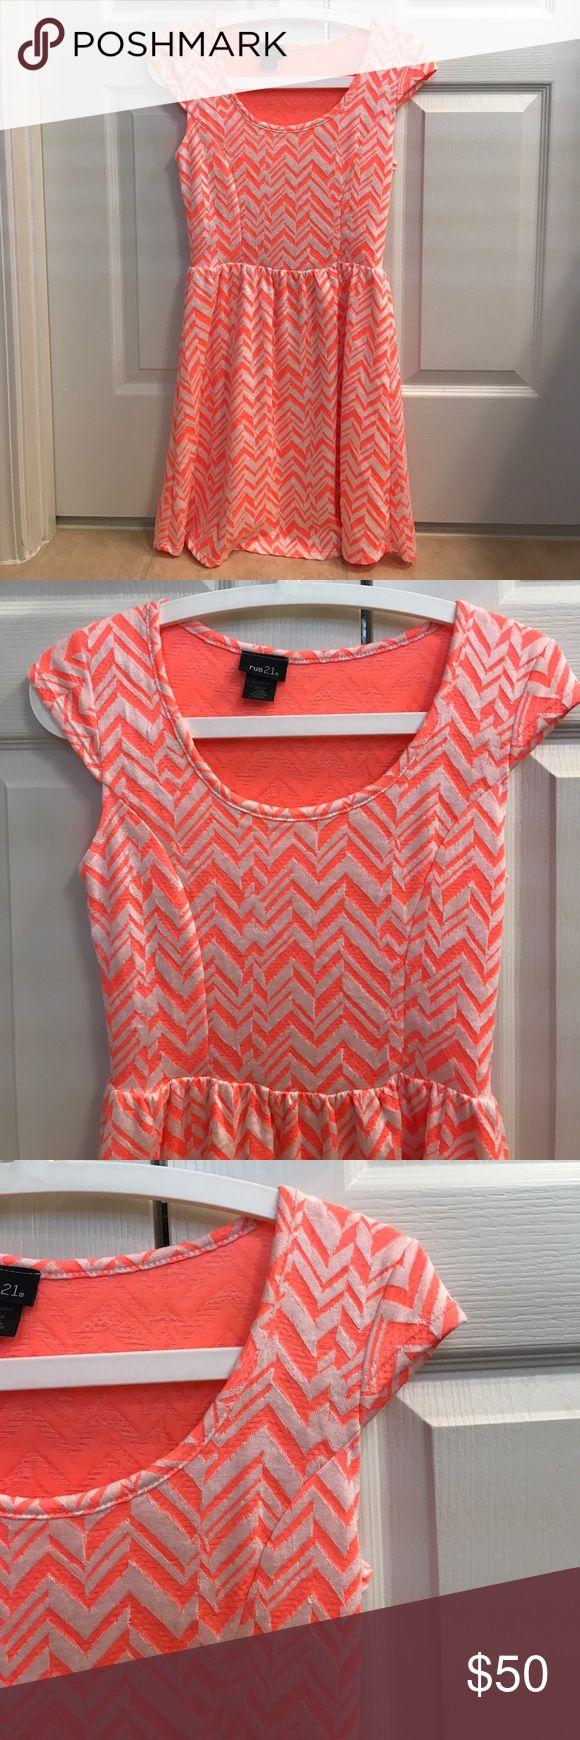 Size M Rue 21 orange chevron cap sleeve dress Size M Rue 21 orange chevron cap sleeve dress Rue21 Dresses